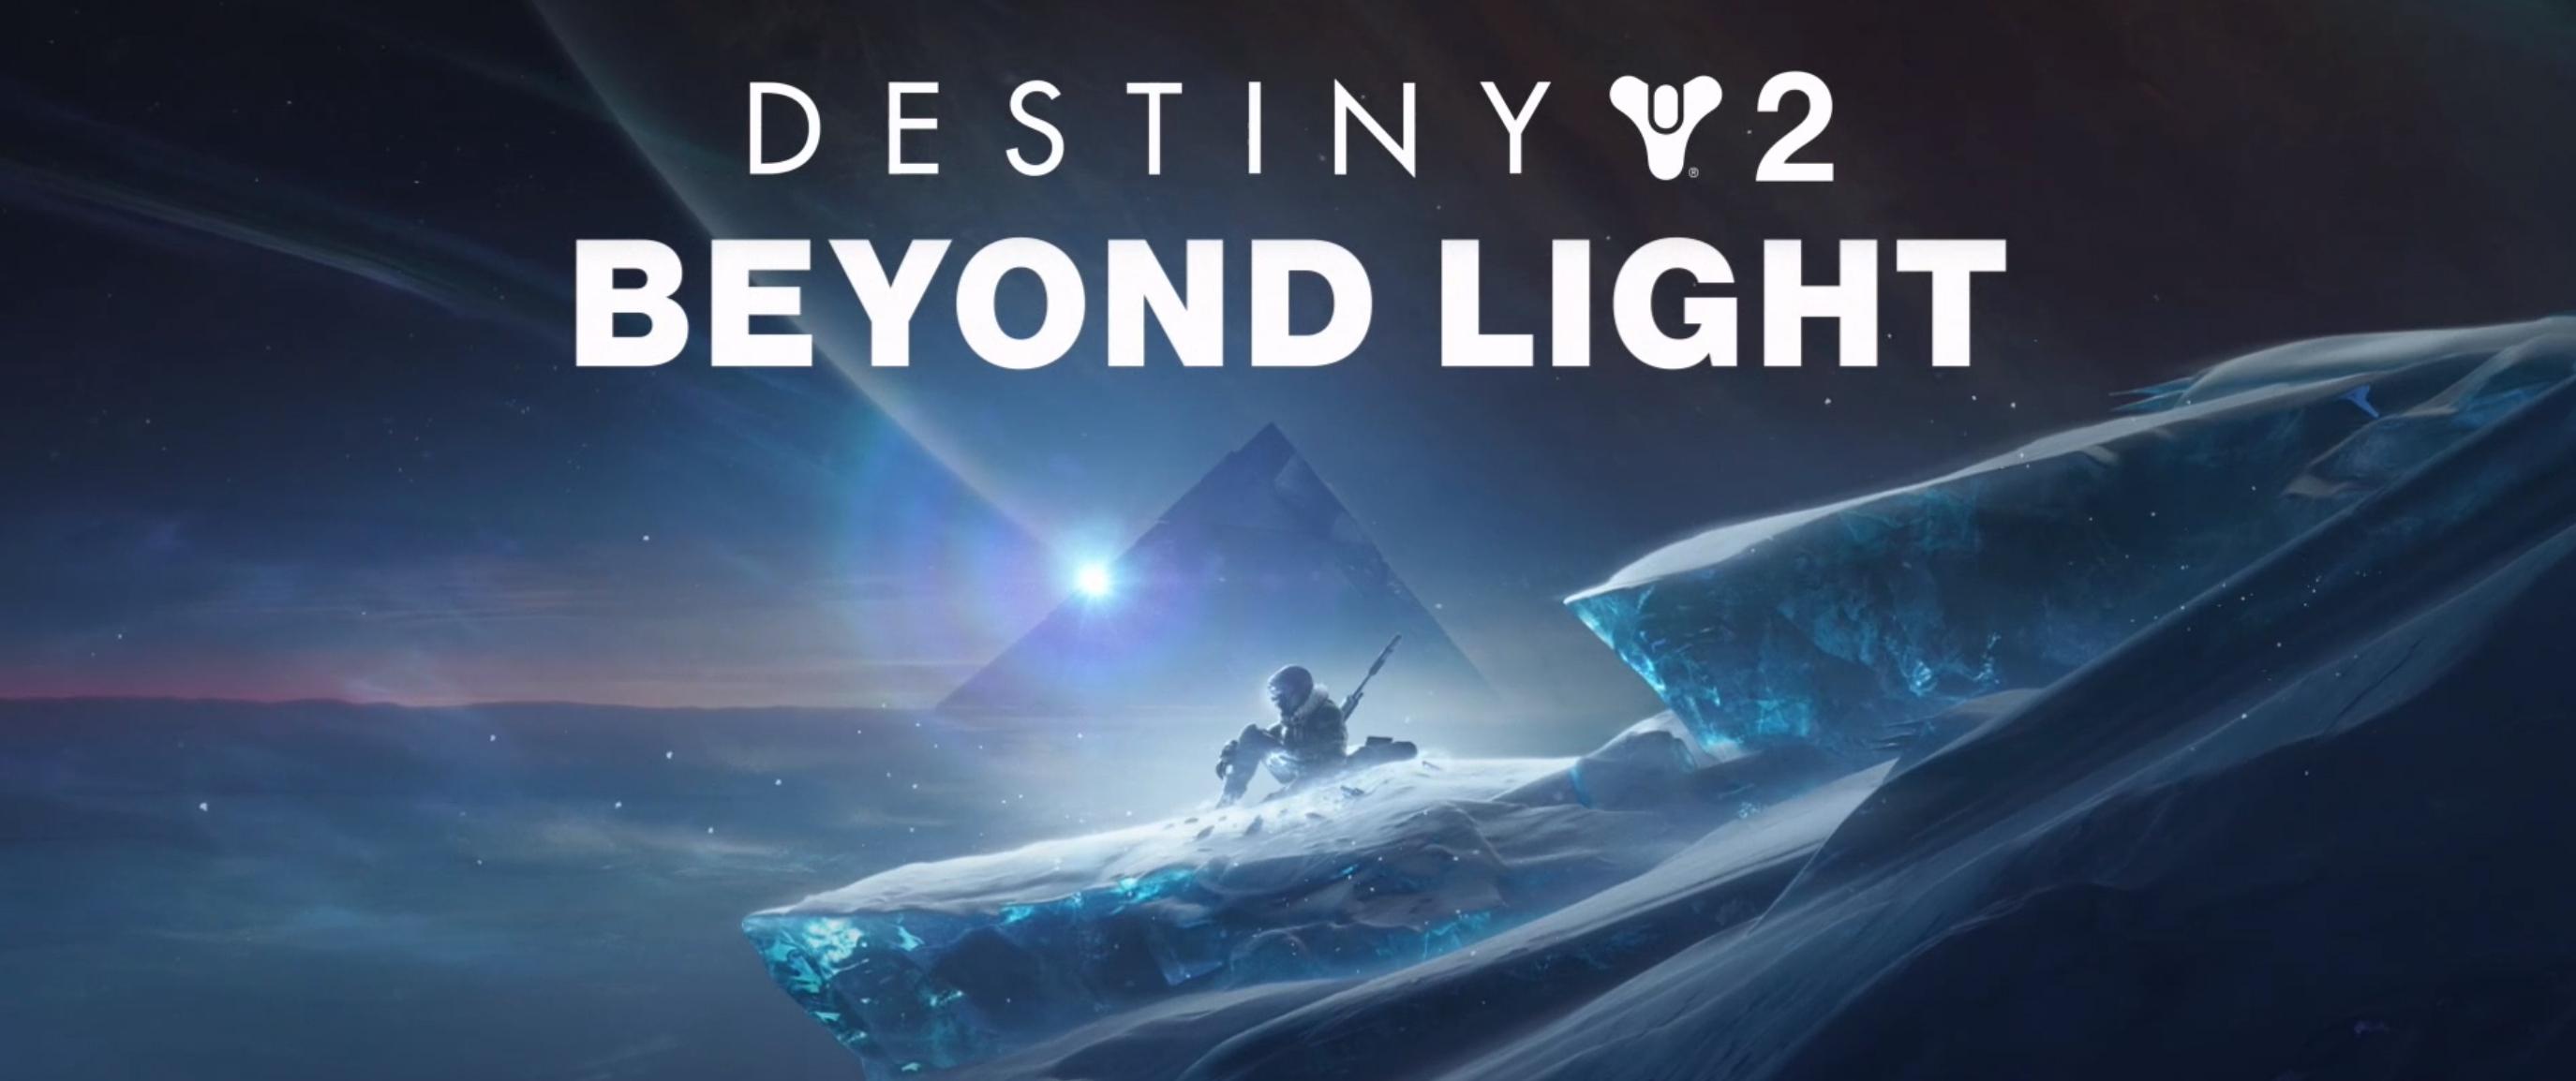 Destiny 2: Beyond Light begins a new era for the MMO shooter September 22 |  VentureBeat